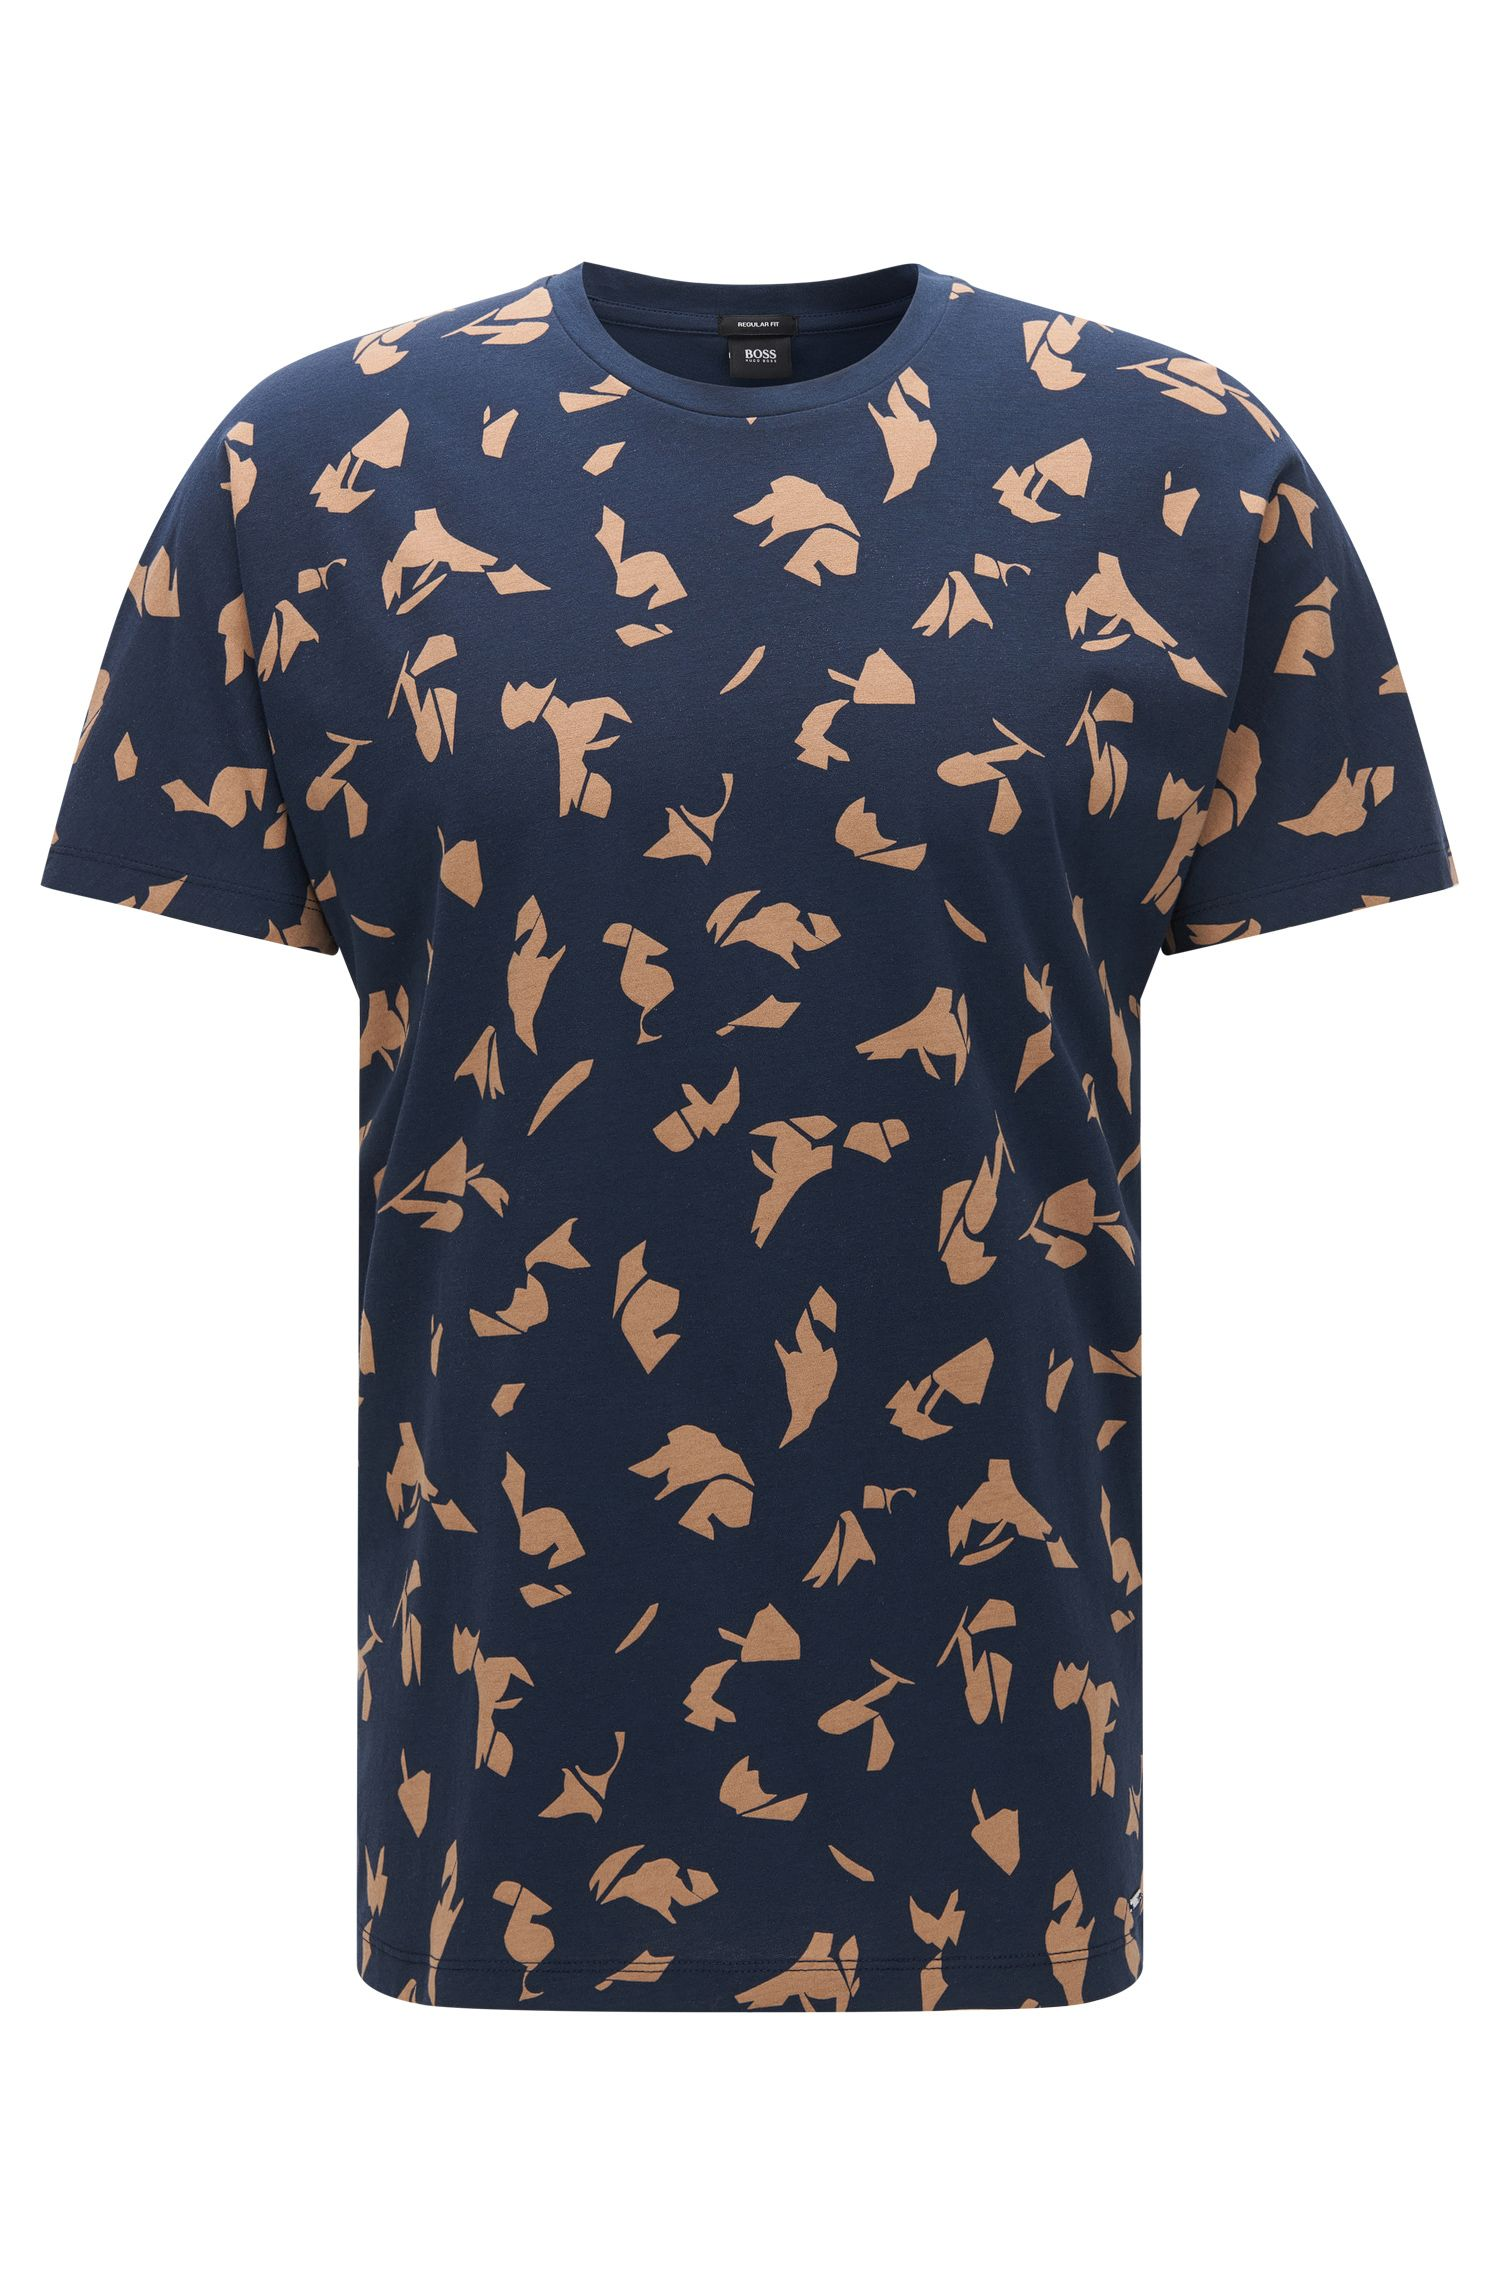 Patterned Cotton T-Shirt   Tiburt